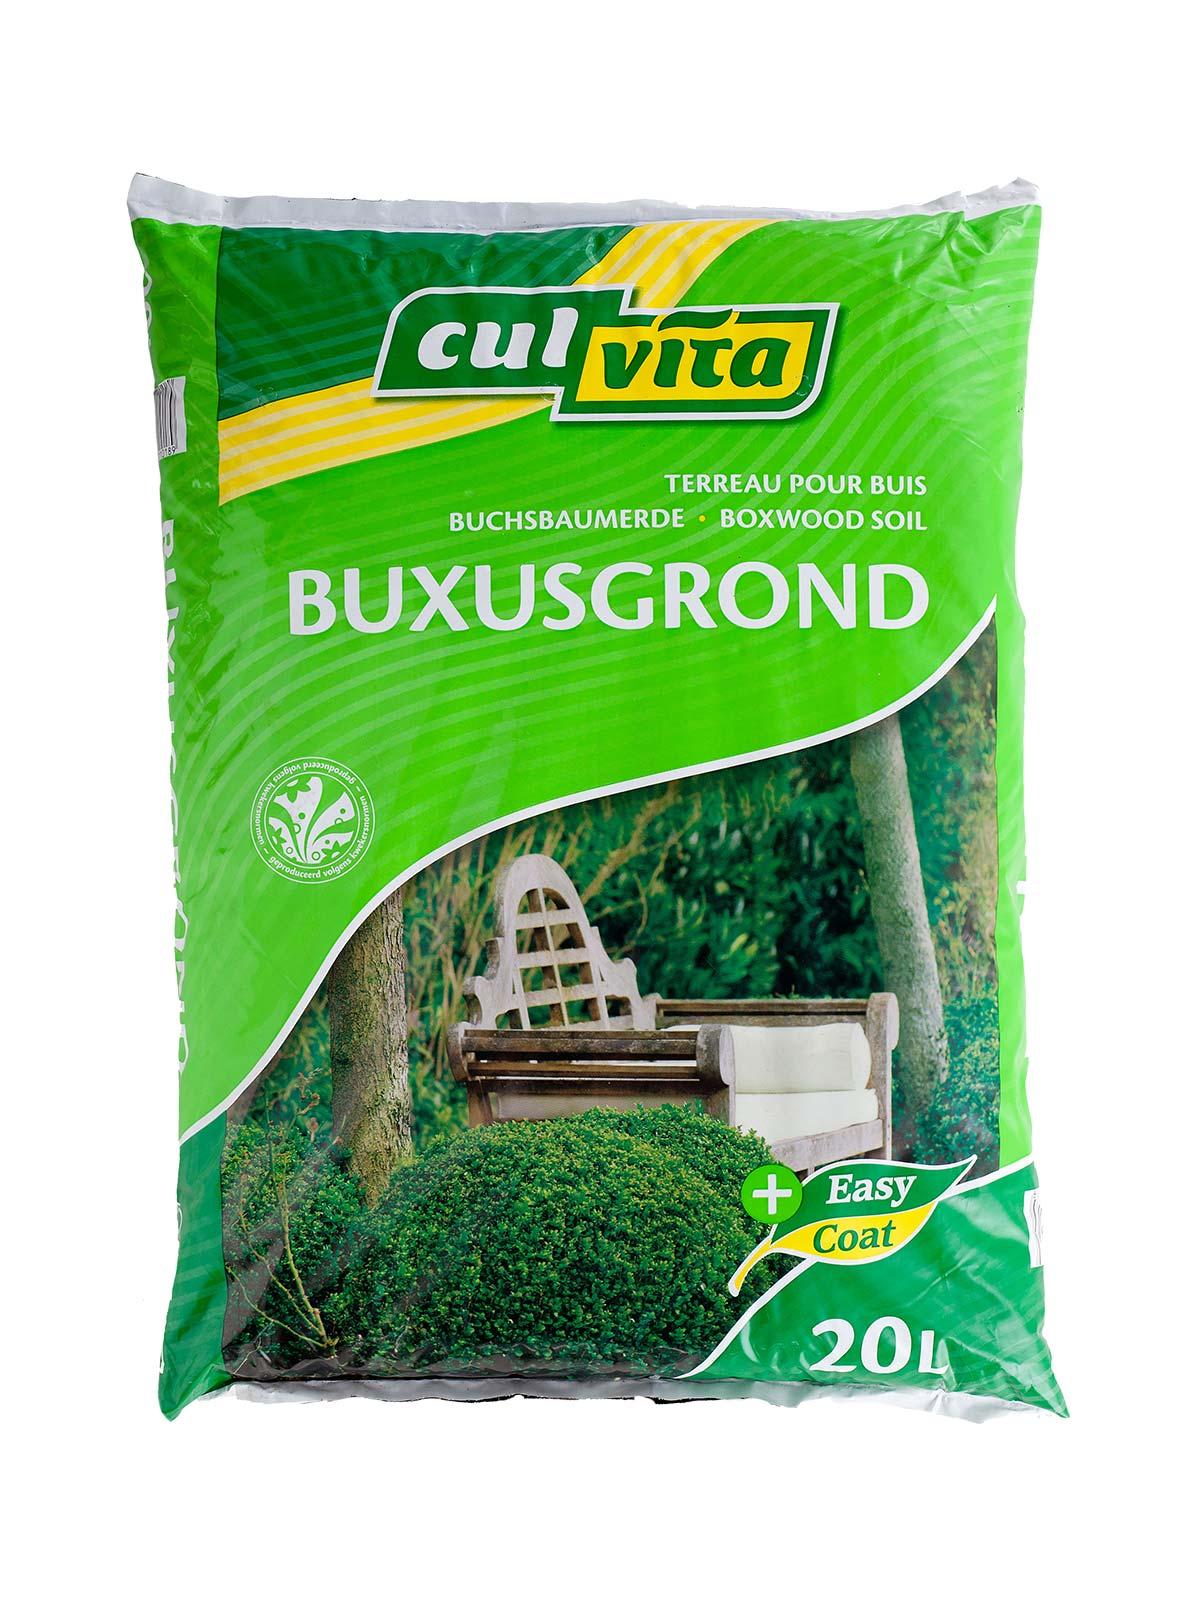 Culvita Buxusgrond | Culvita.nl